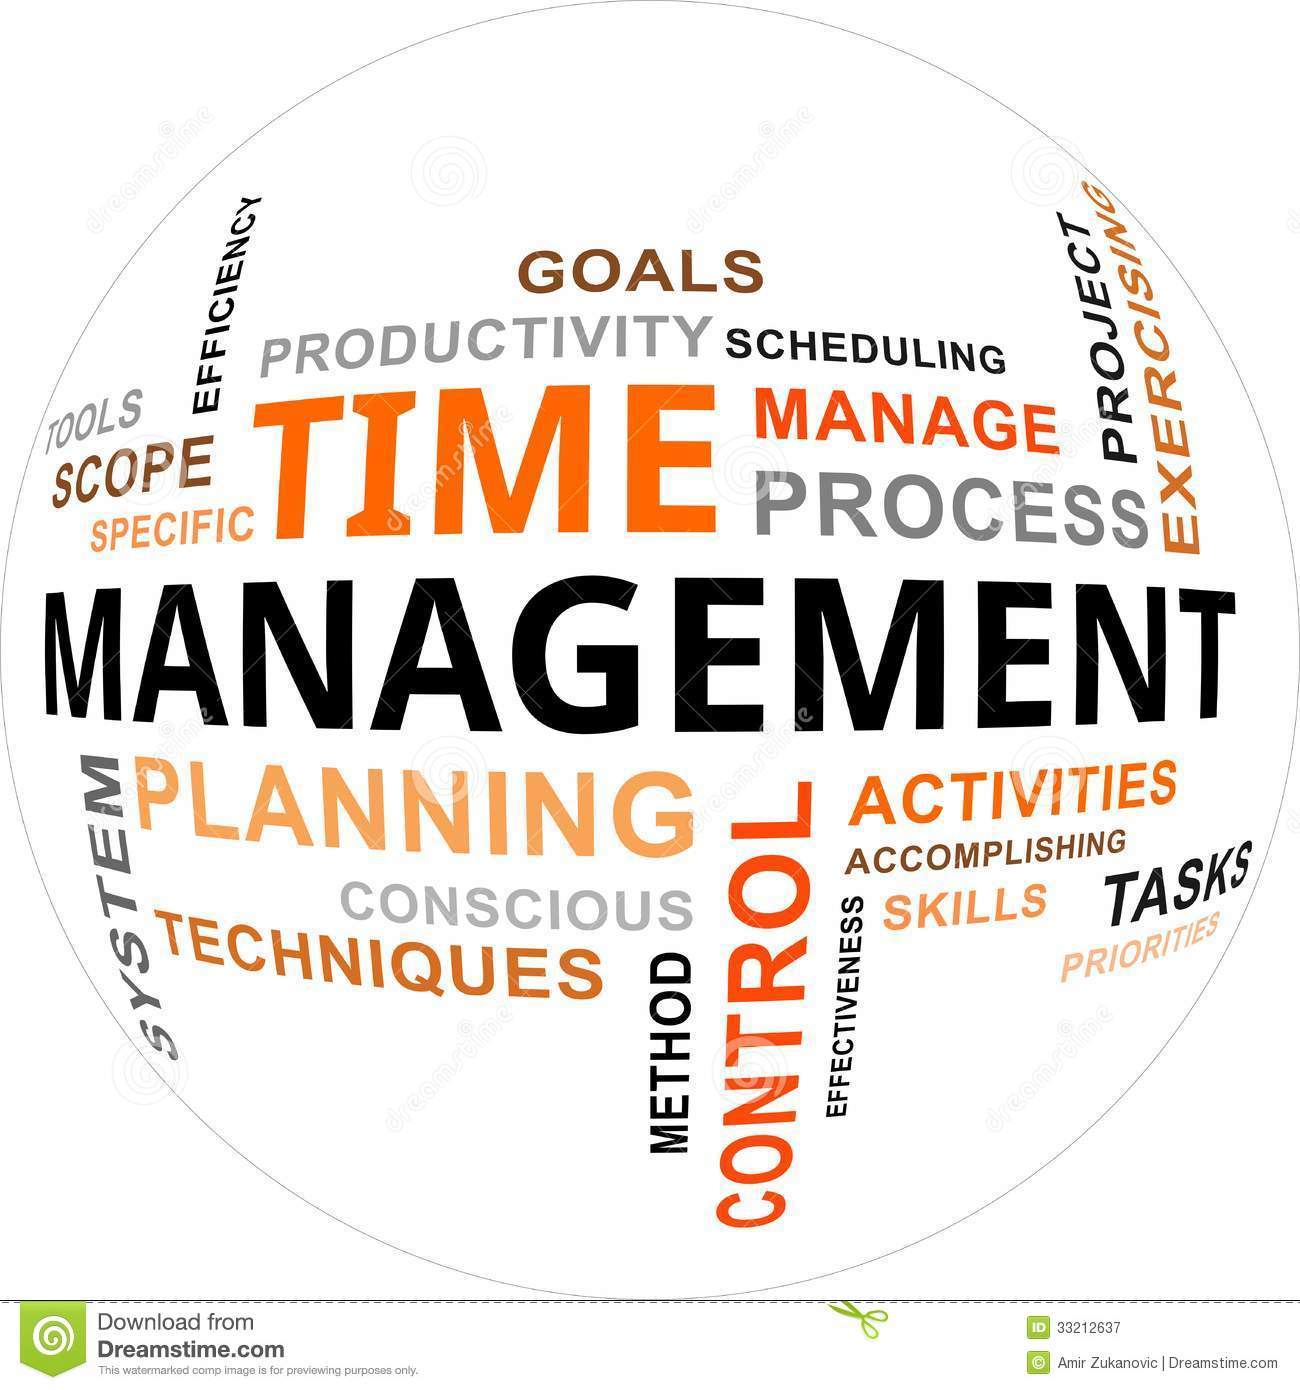 Time management as a university student easyuni forums word cloud time management related items 33212637g1300x1390 140 kb altavistaventures Image collections